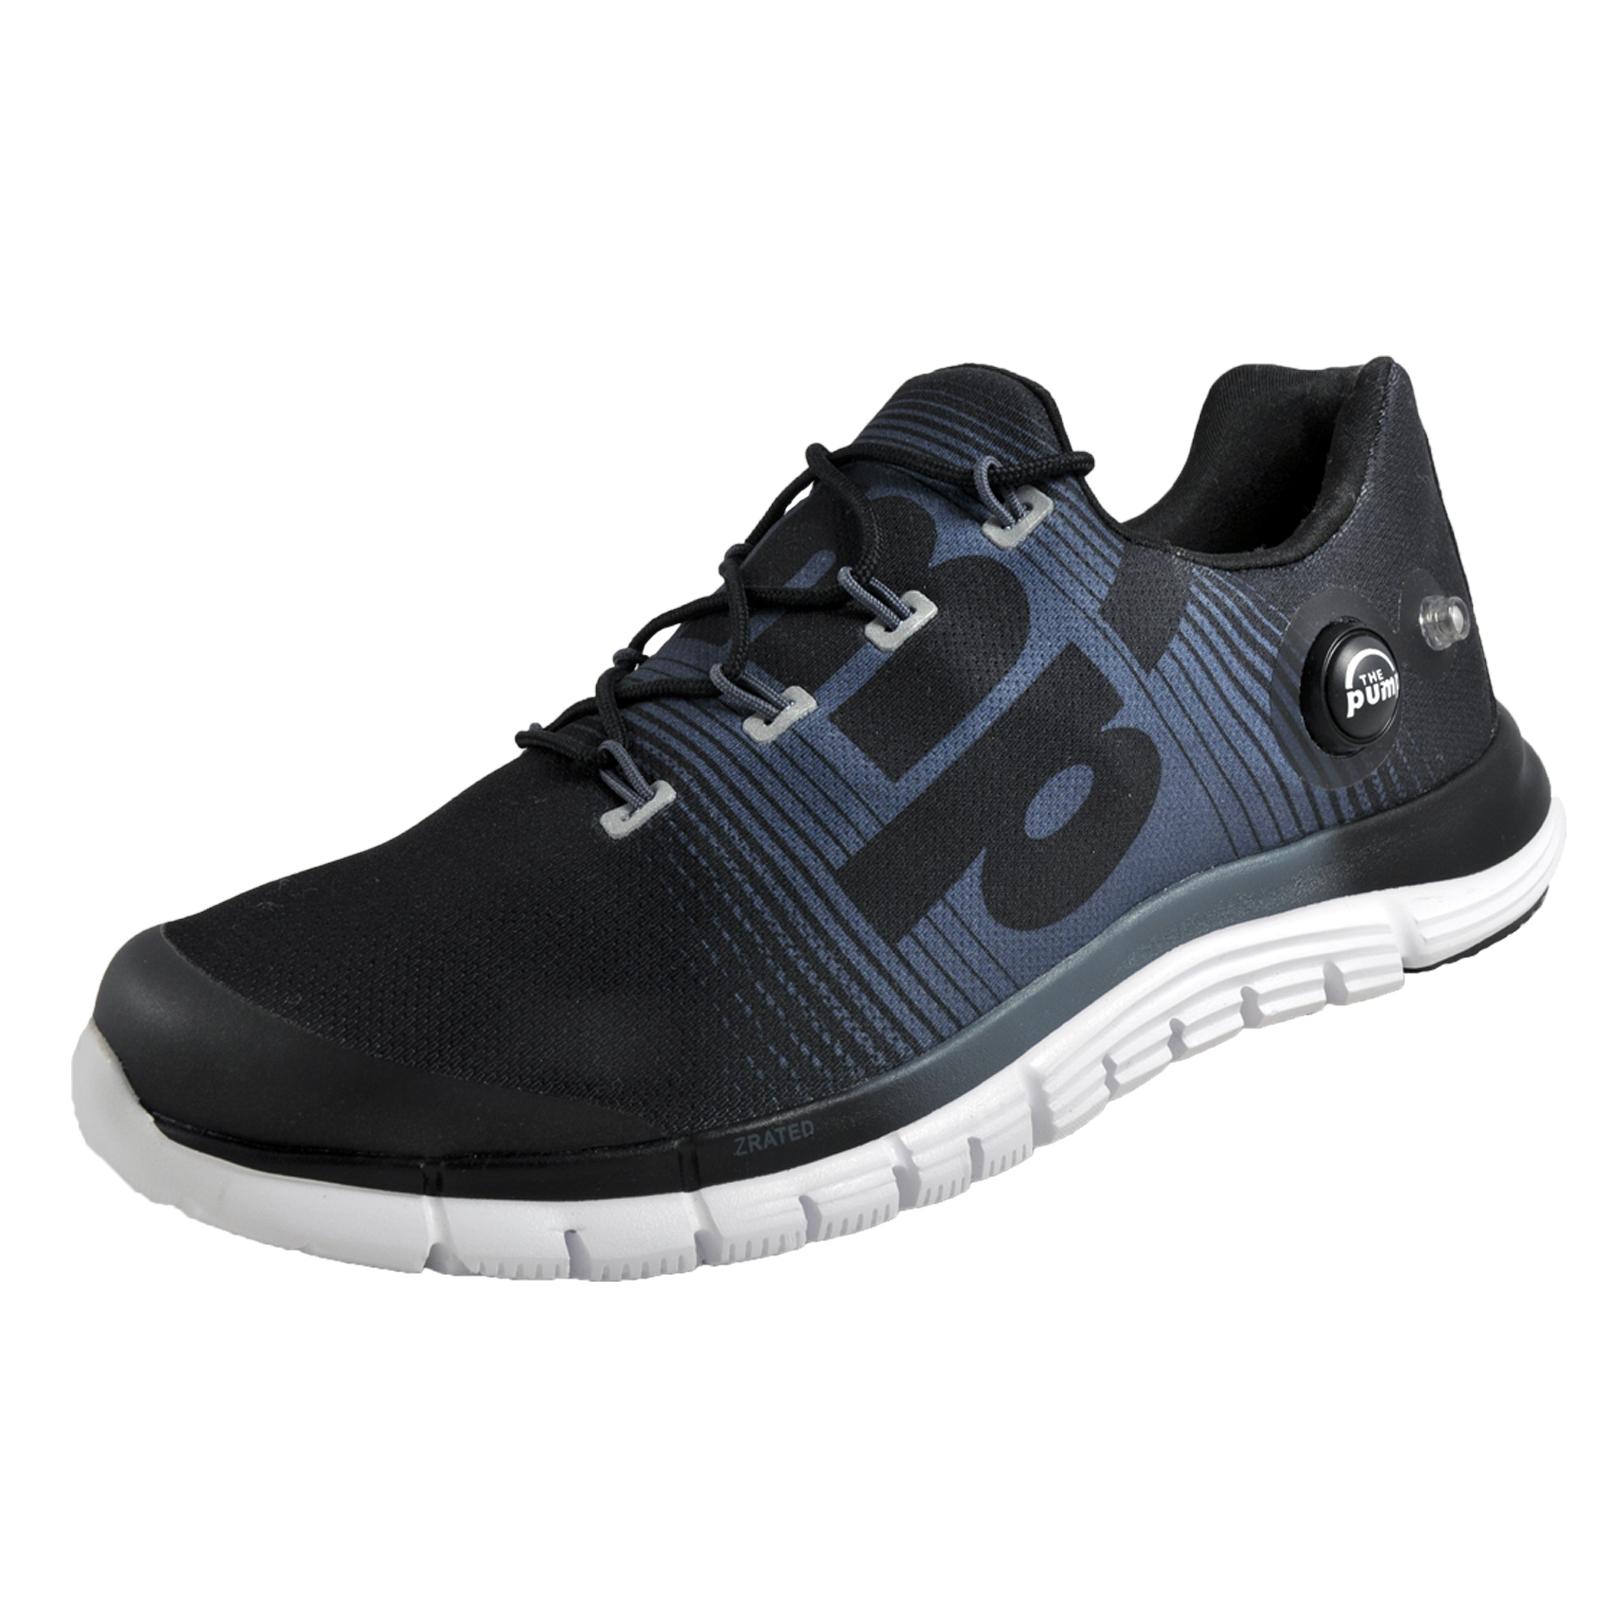 Reebok Z Pump Fusion Mens Running Shoes